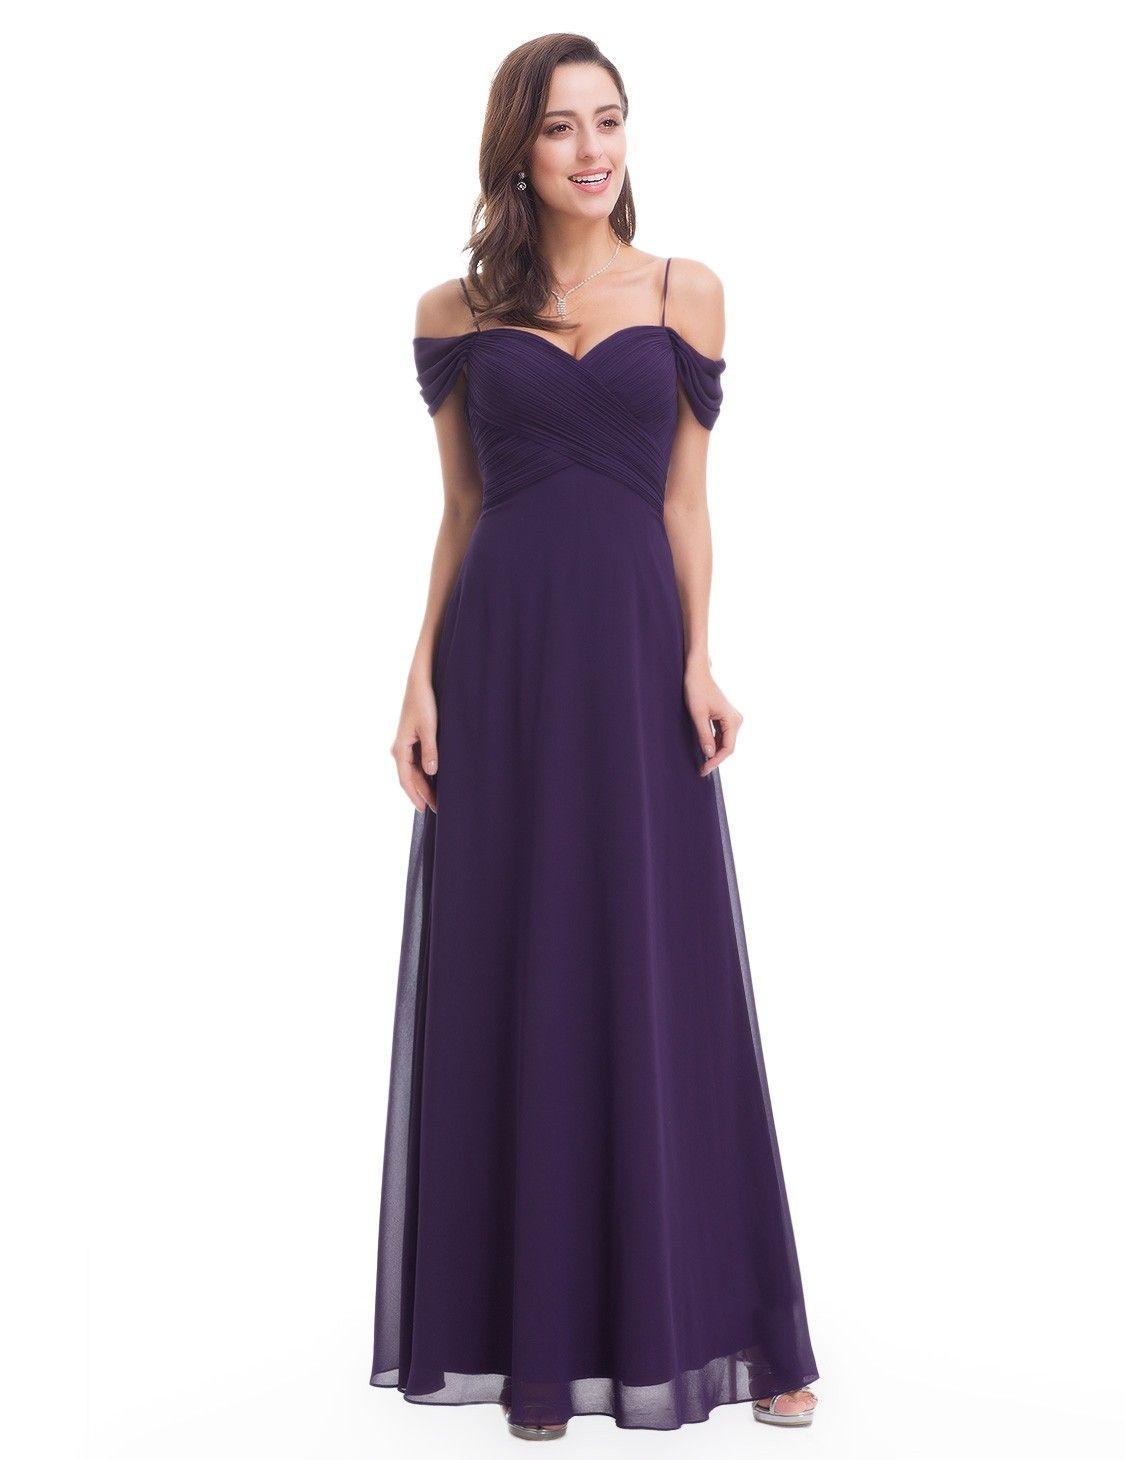 775d4dadbbb Off Shoulder Sweetheart Chiffon Evening Dress